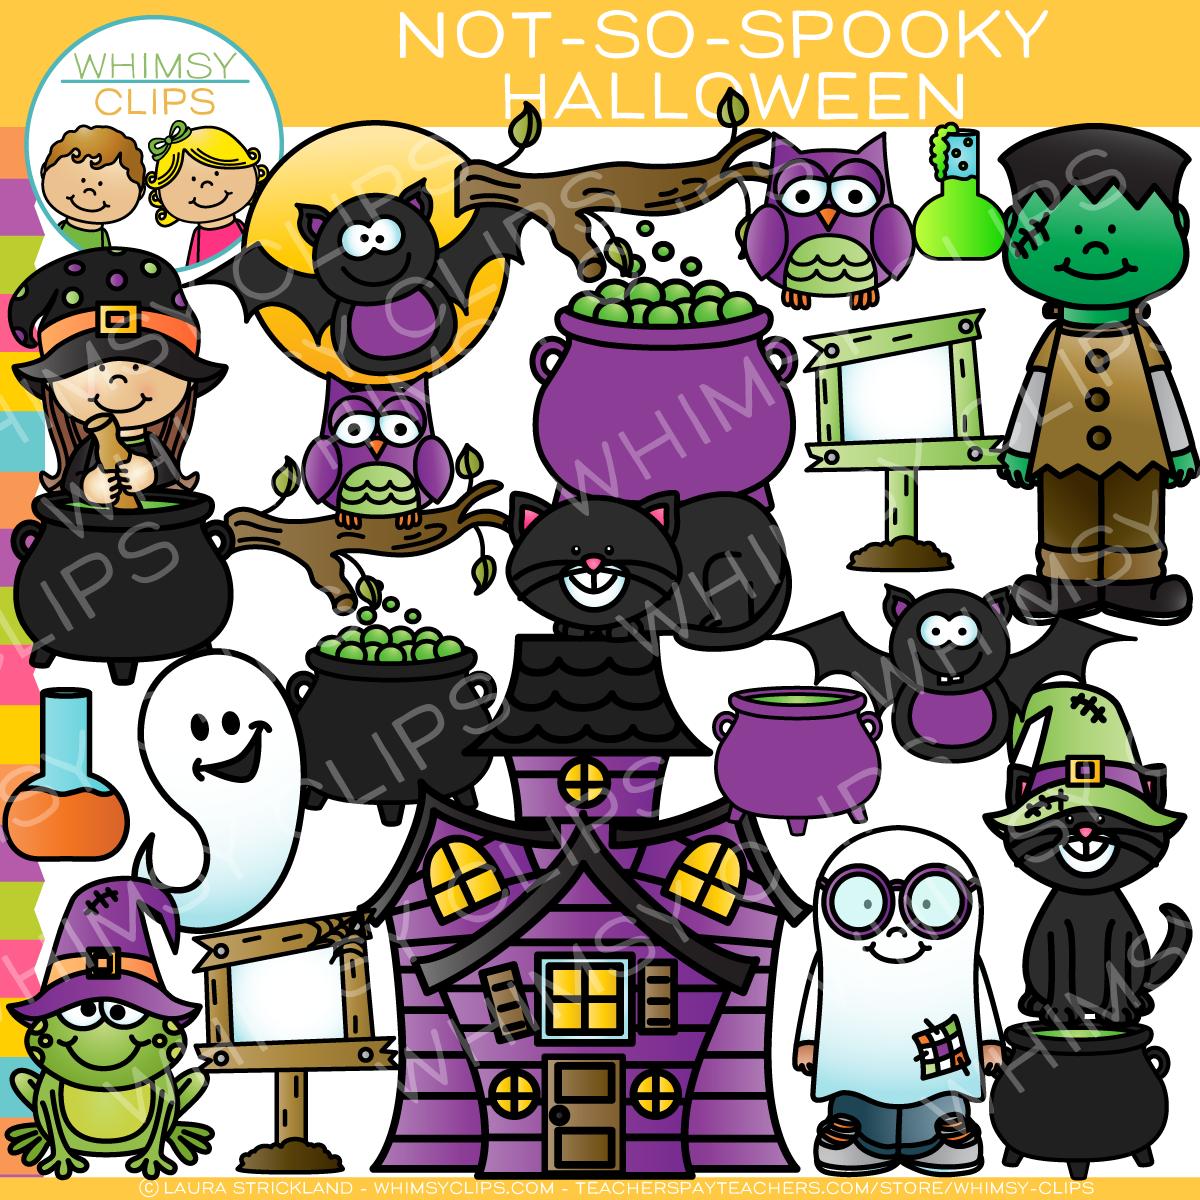 Not So Spooky Halloween Clip Art